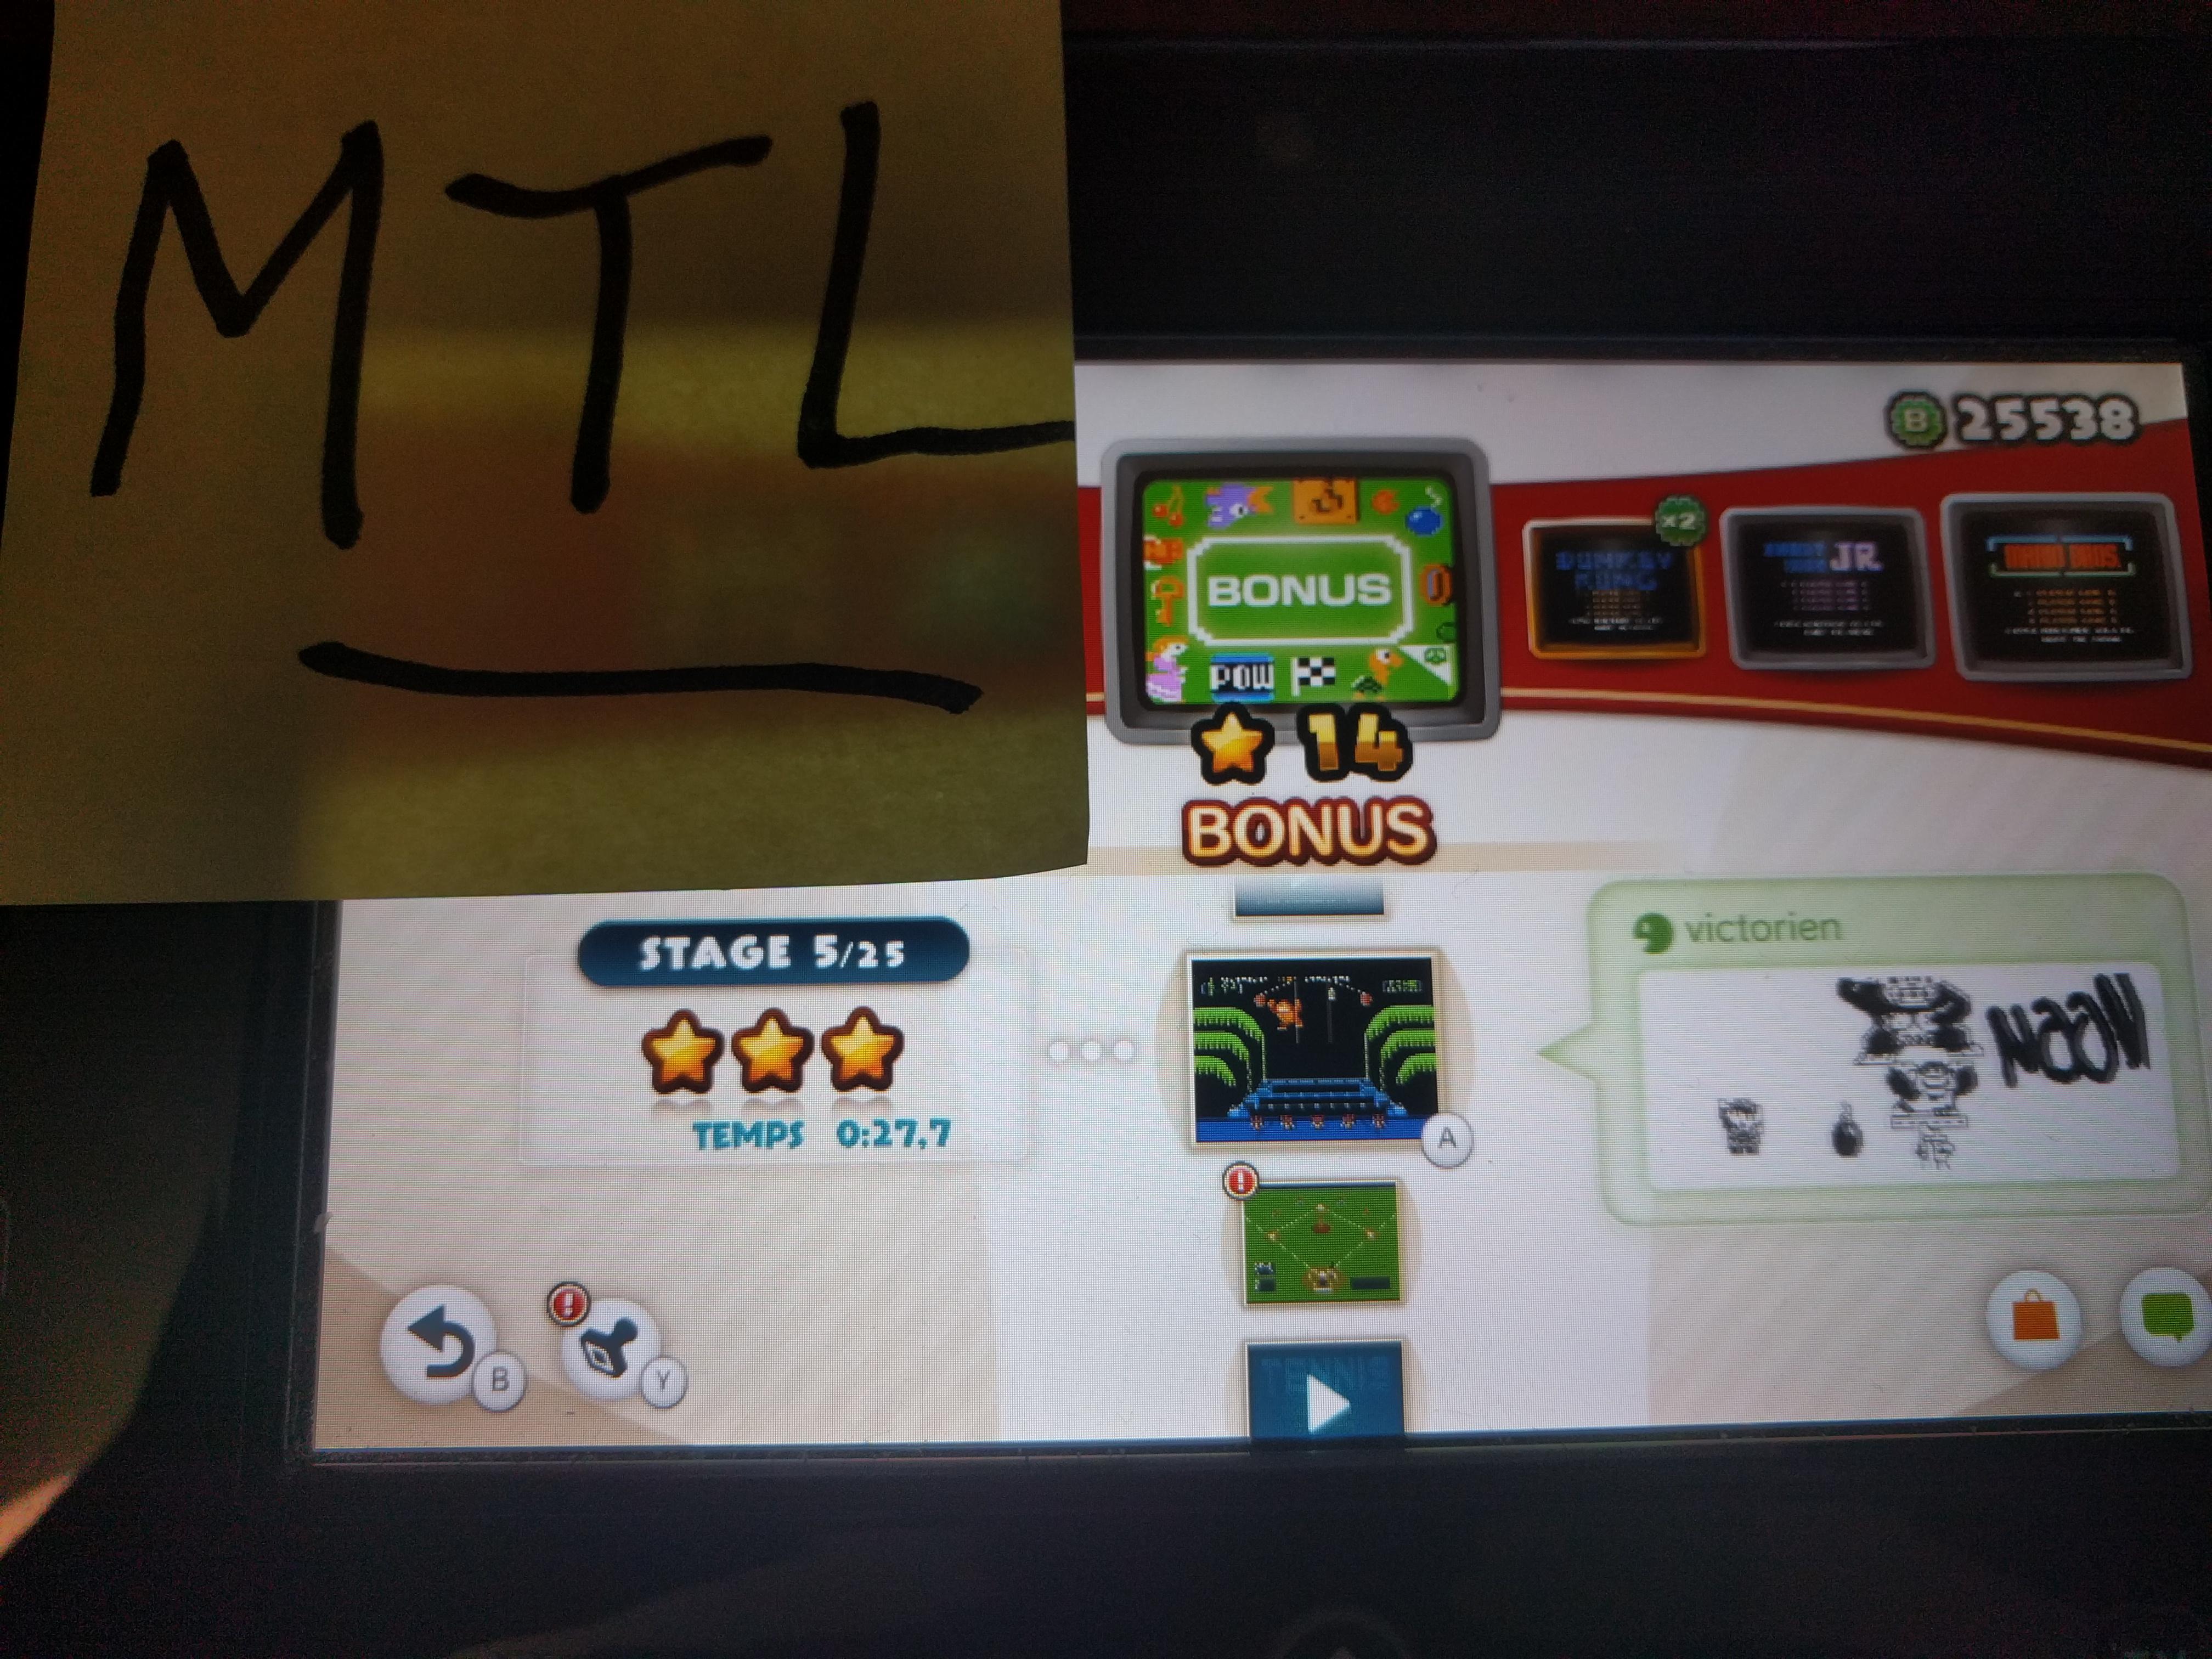 Mantalow: NES Remix: Bonus: Stage 5 (Wii U) 0:00:27.7 points on 2016-06-15 23:29:39